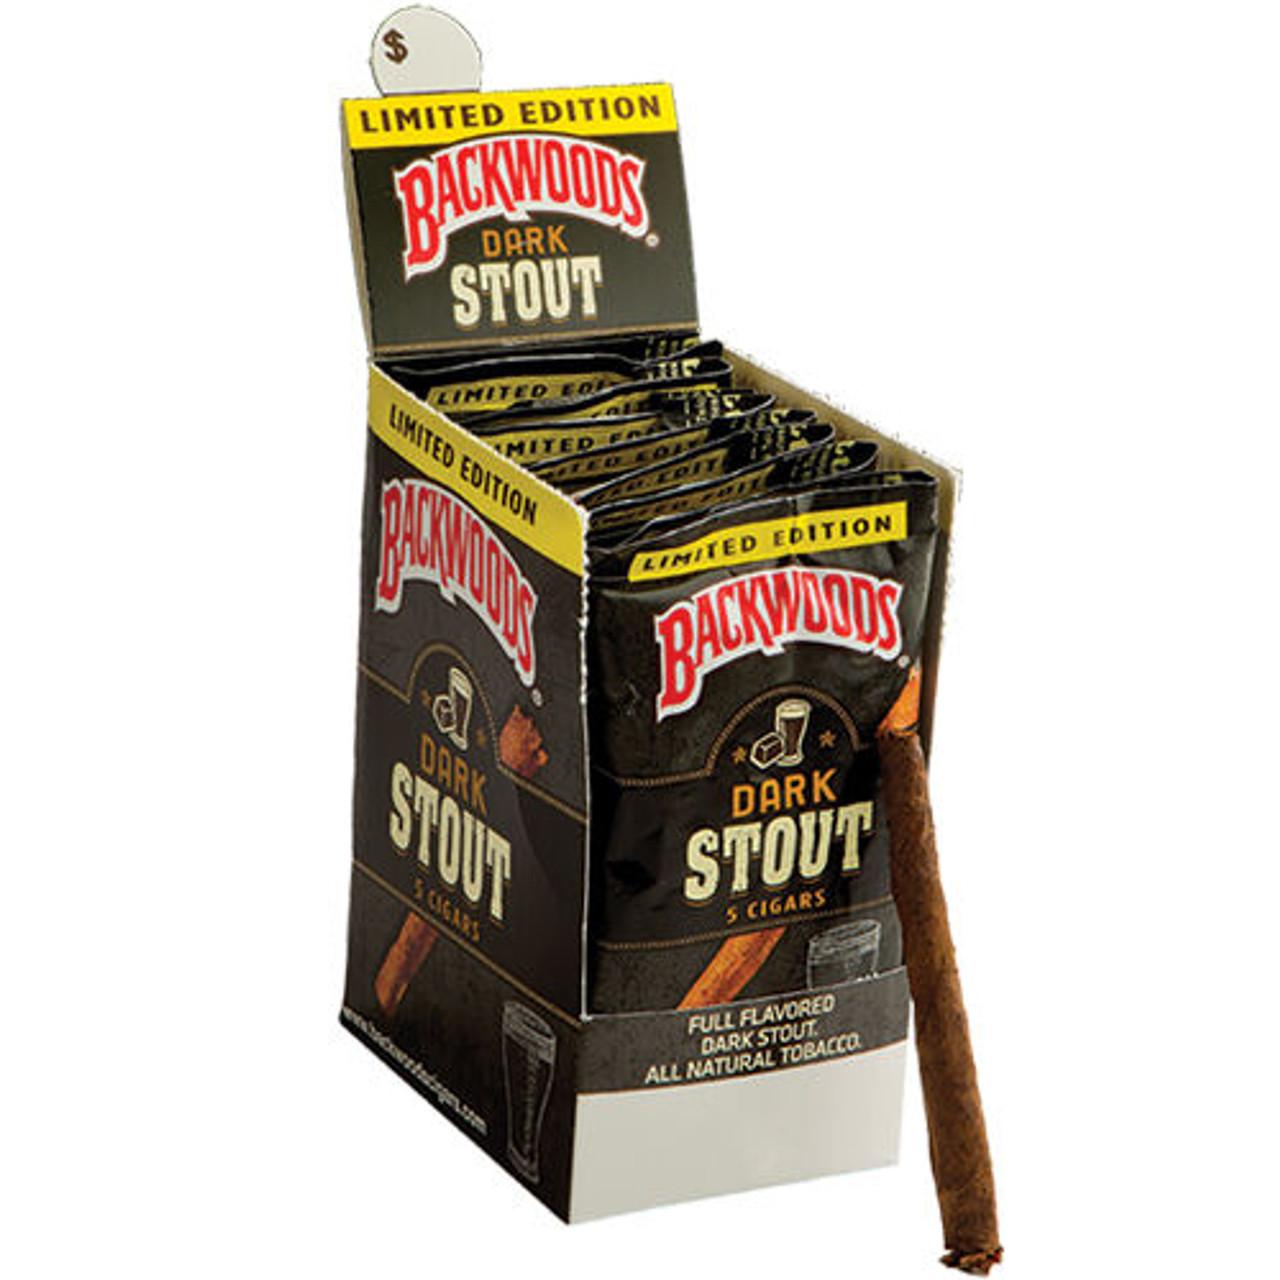 Backwoods Cigars Dark Stout Cigars - 4.5 x 32 (Box of 24)